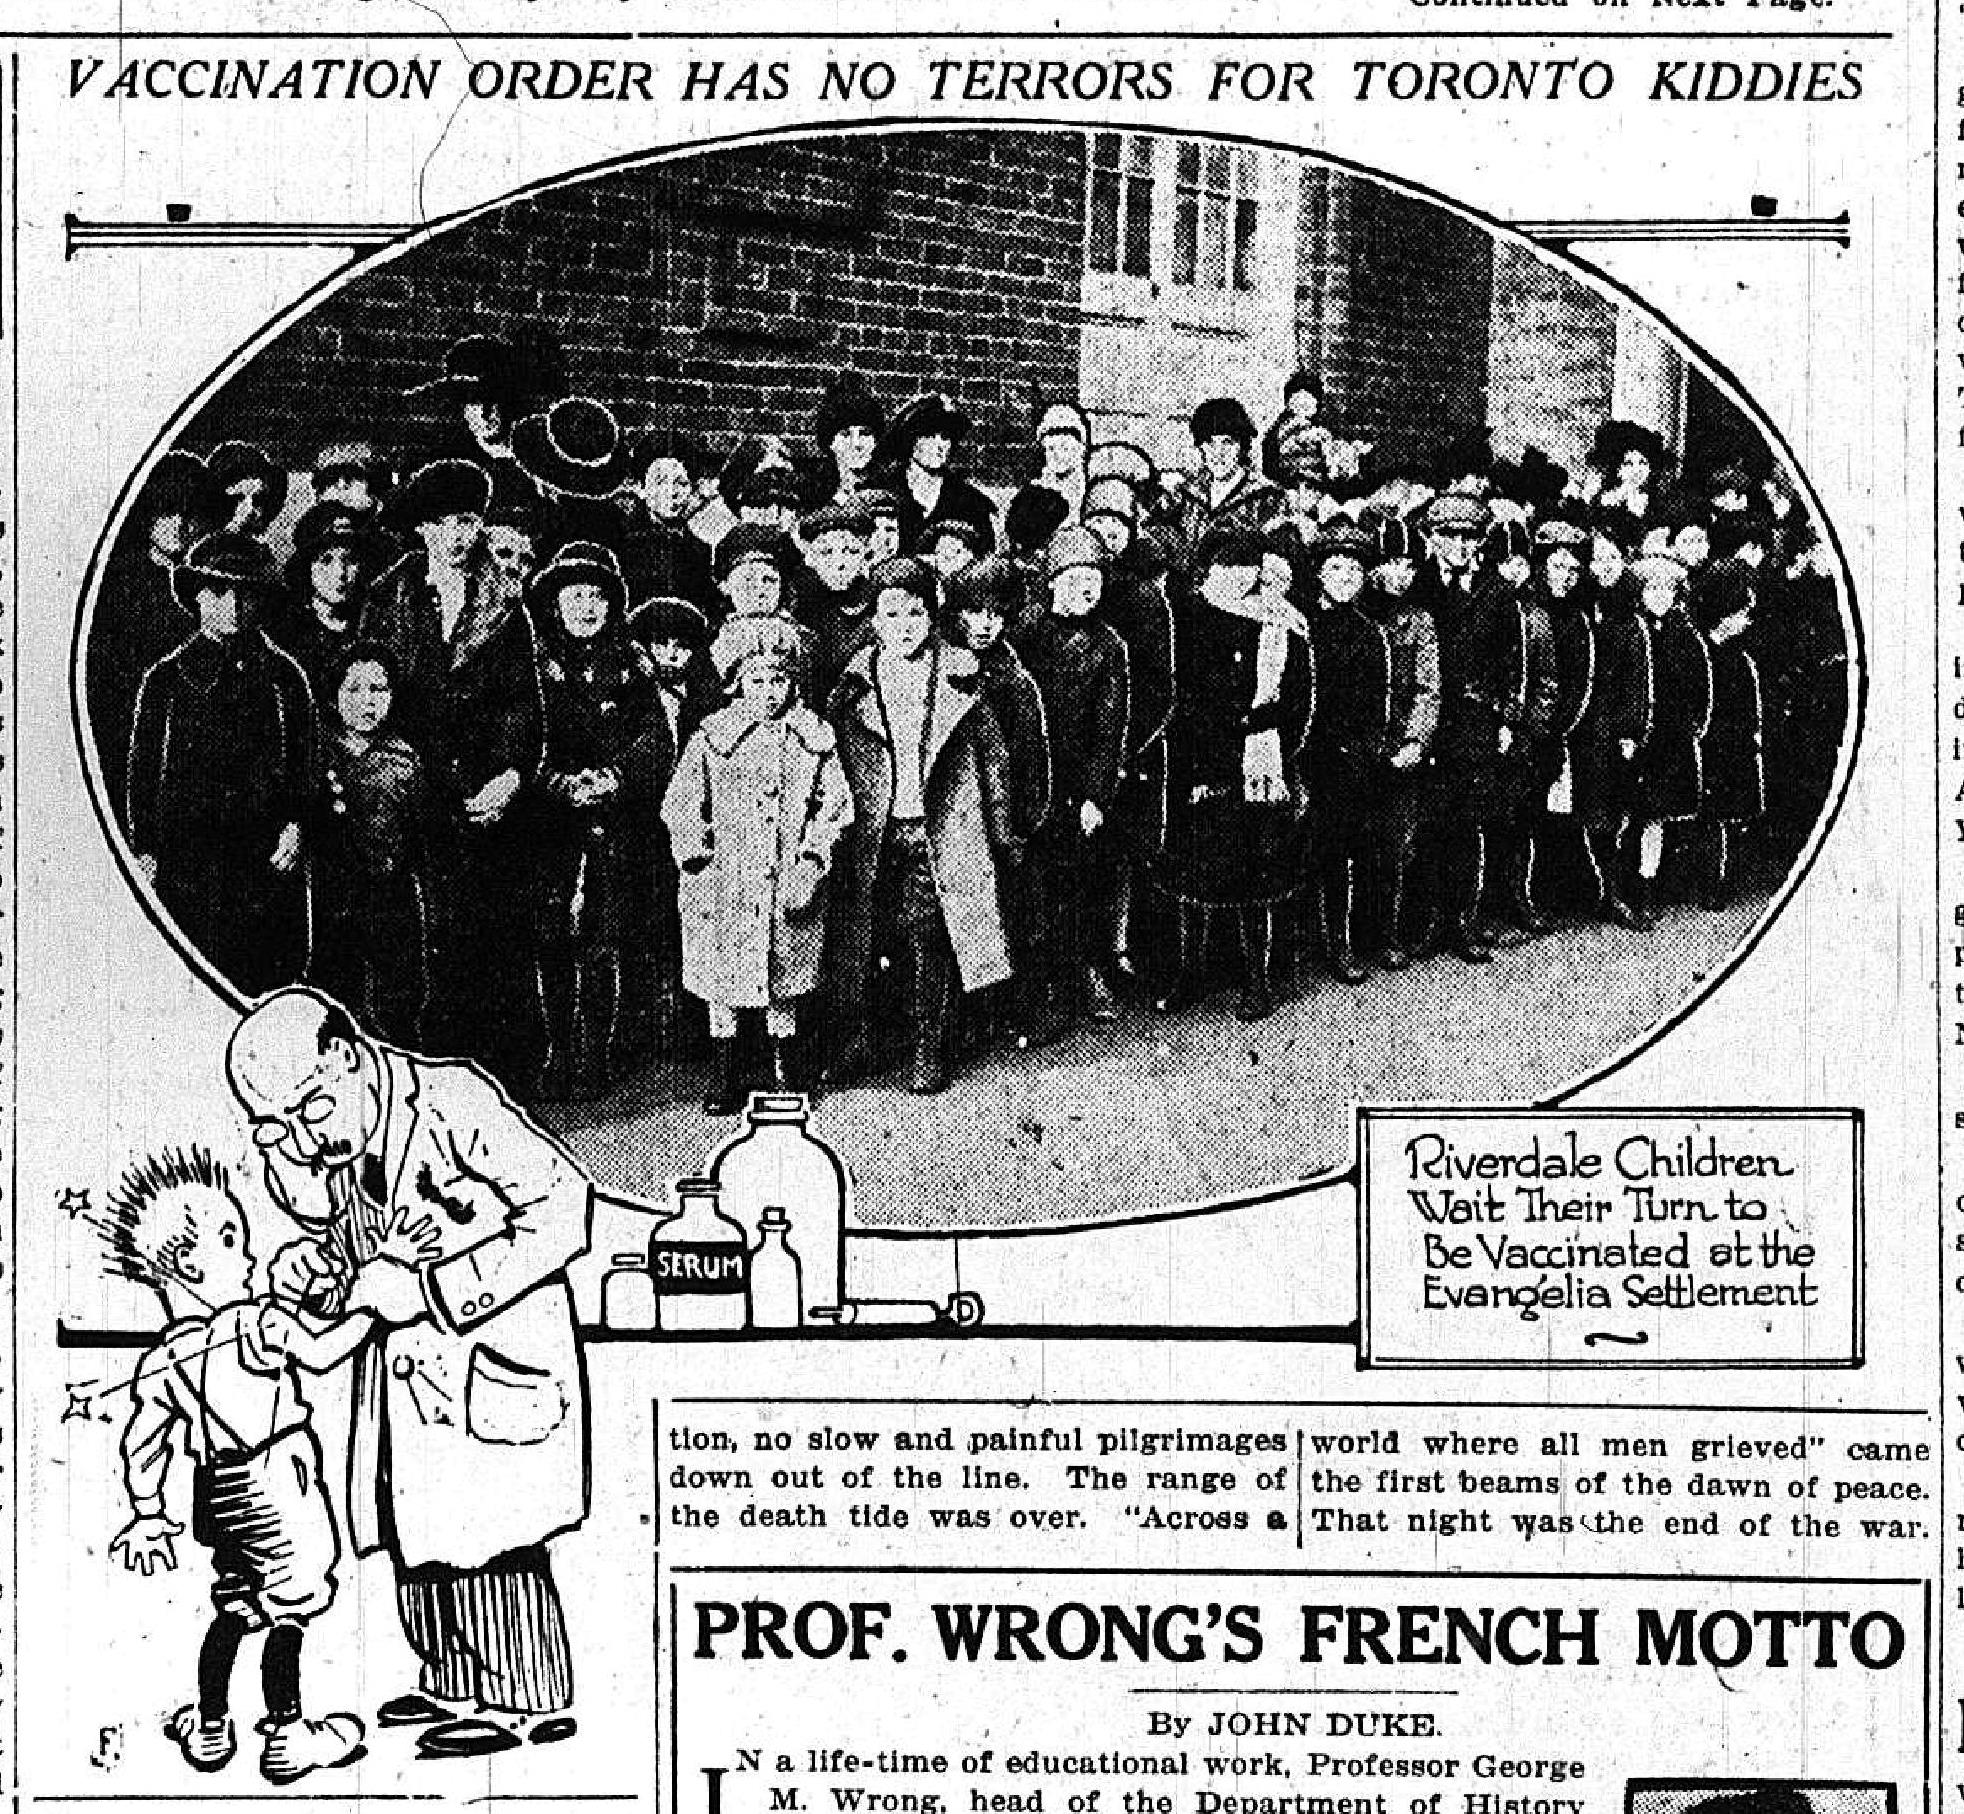 Vaccination Order Has No Terrors For Toronto Kiddies, Toronto Star Weekly  Nov. 15,